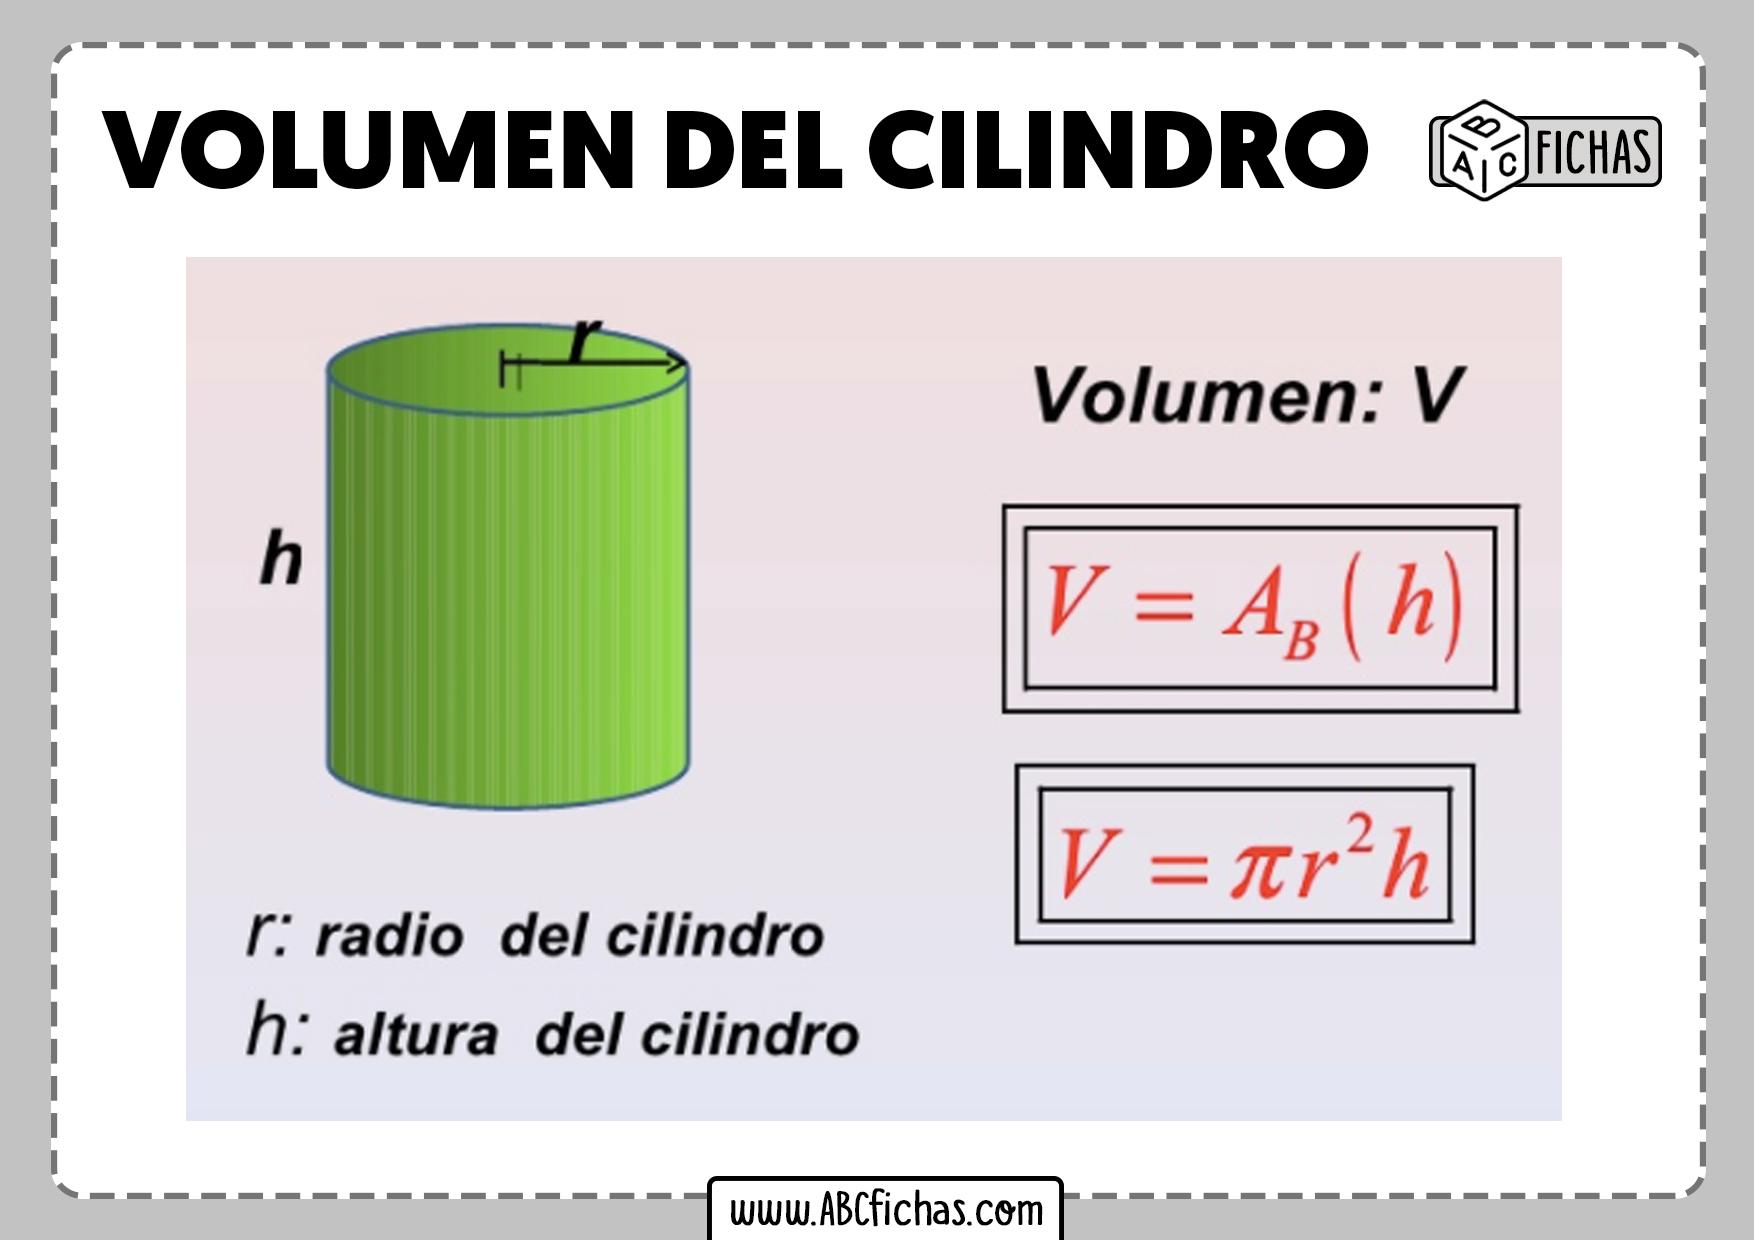 Volumen del cilindro formula